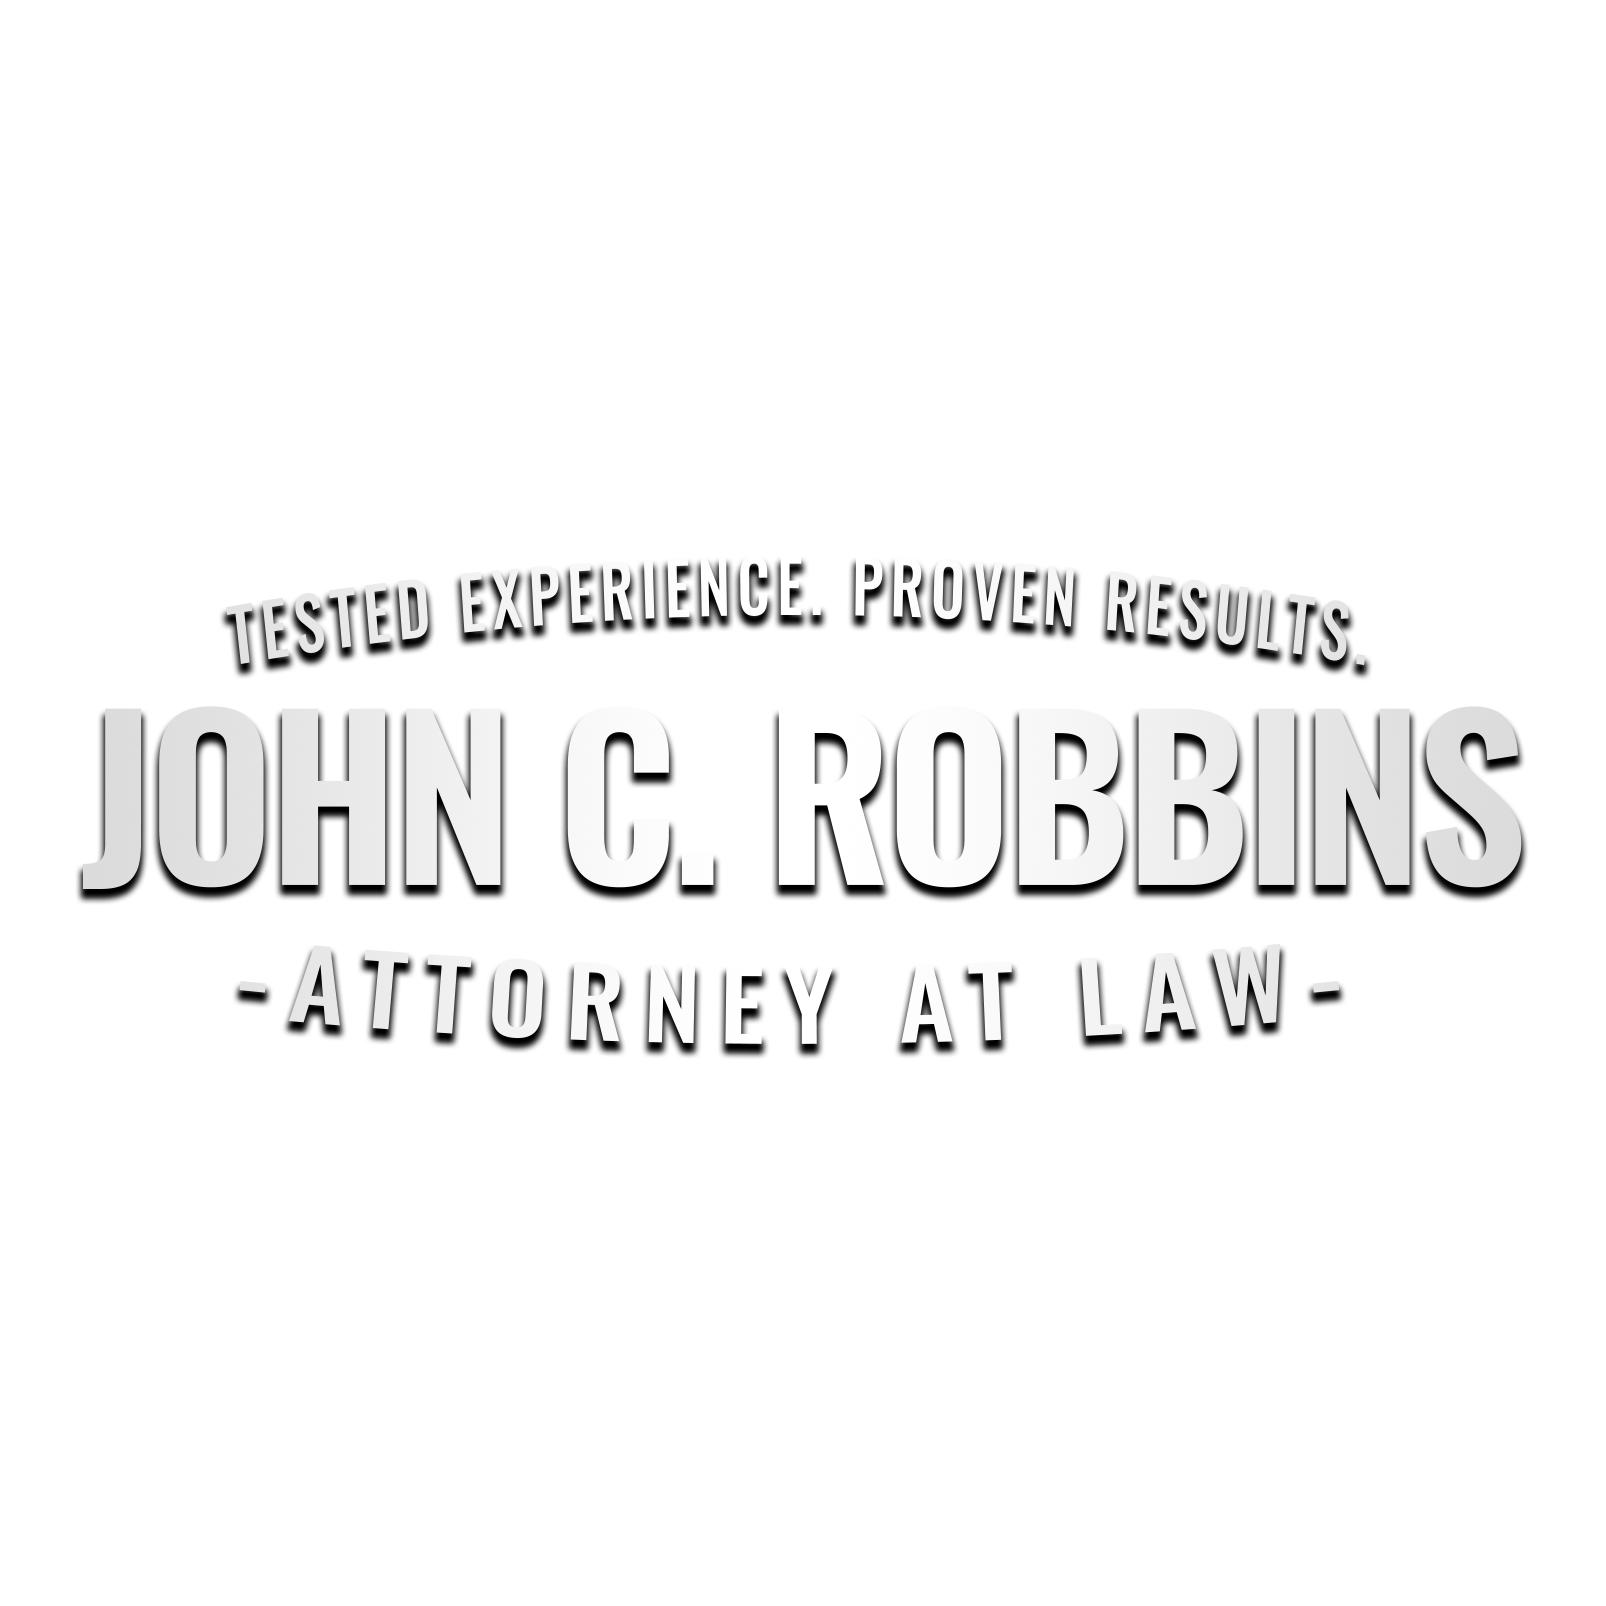 John C Robbins, Attorney at Law